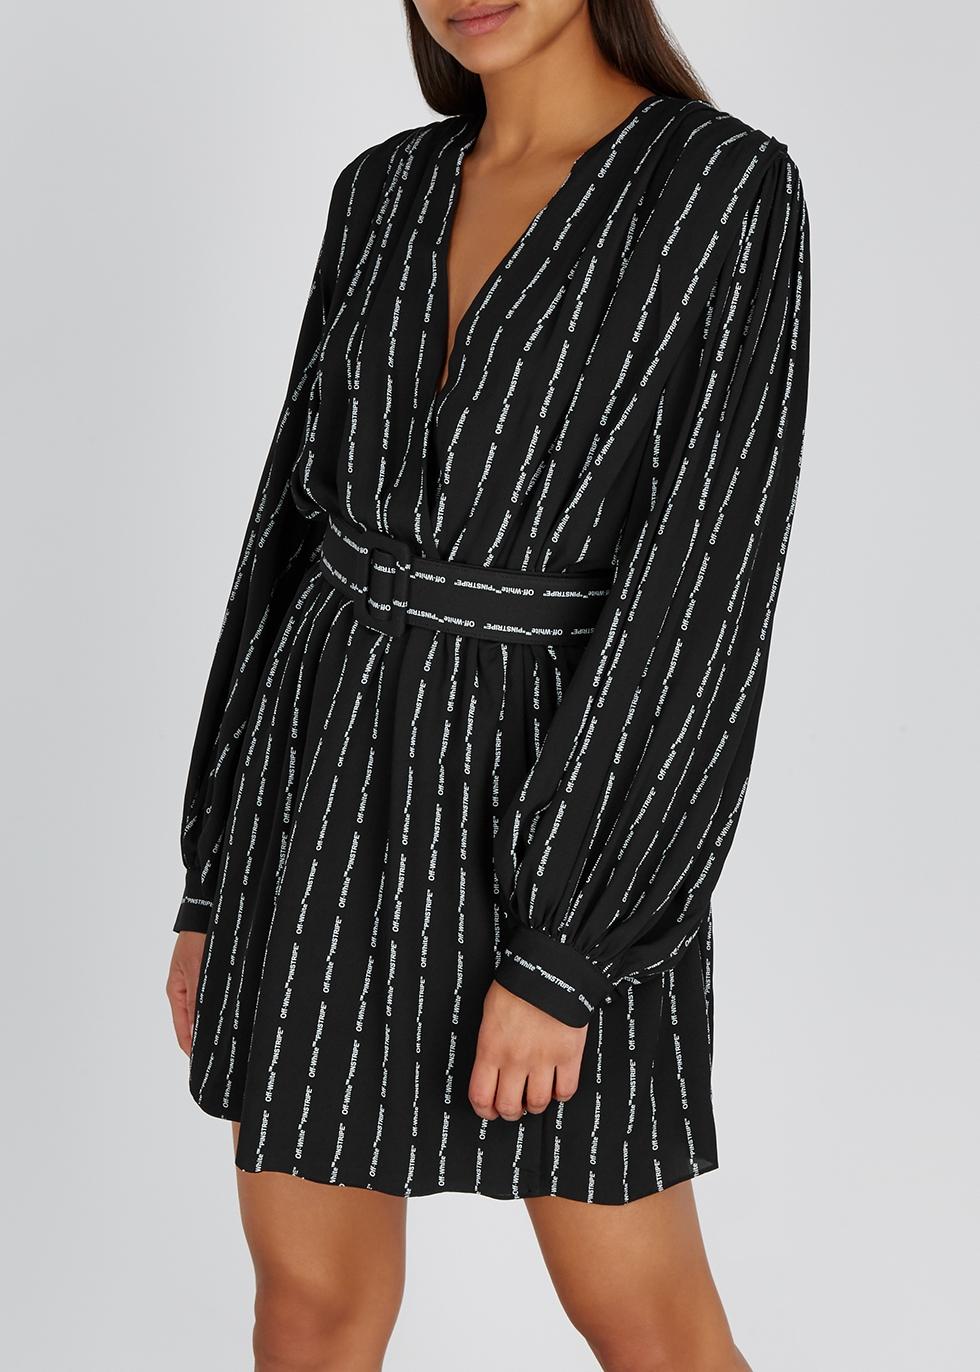 Black printed crepe dress - Off-White